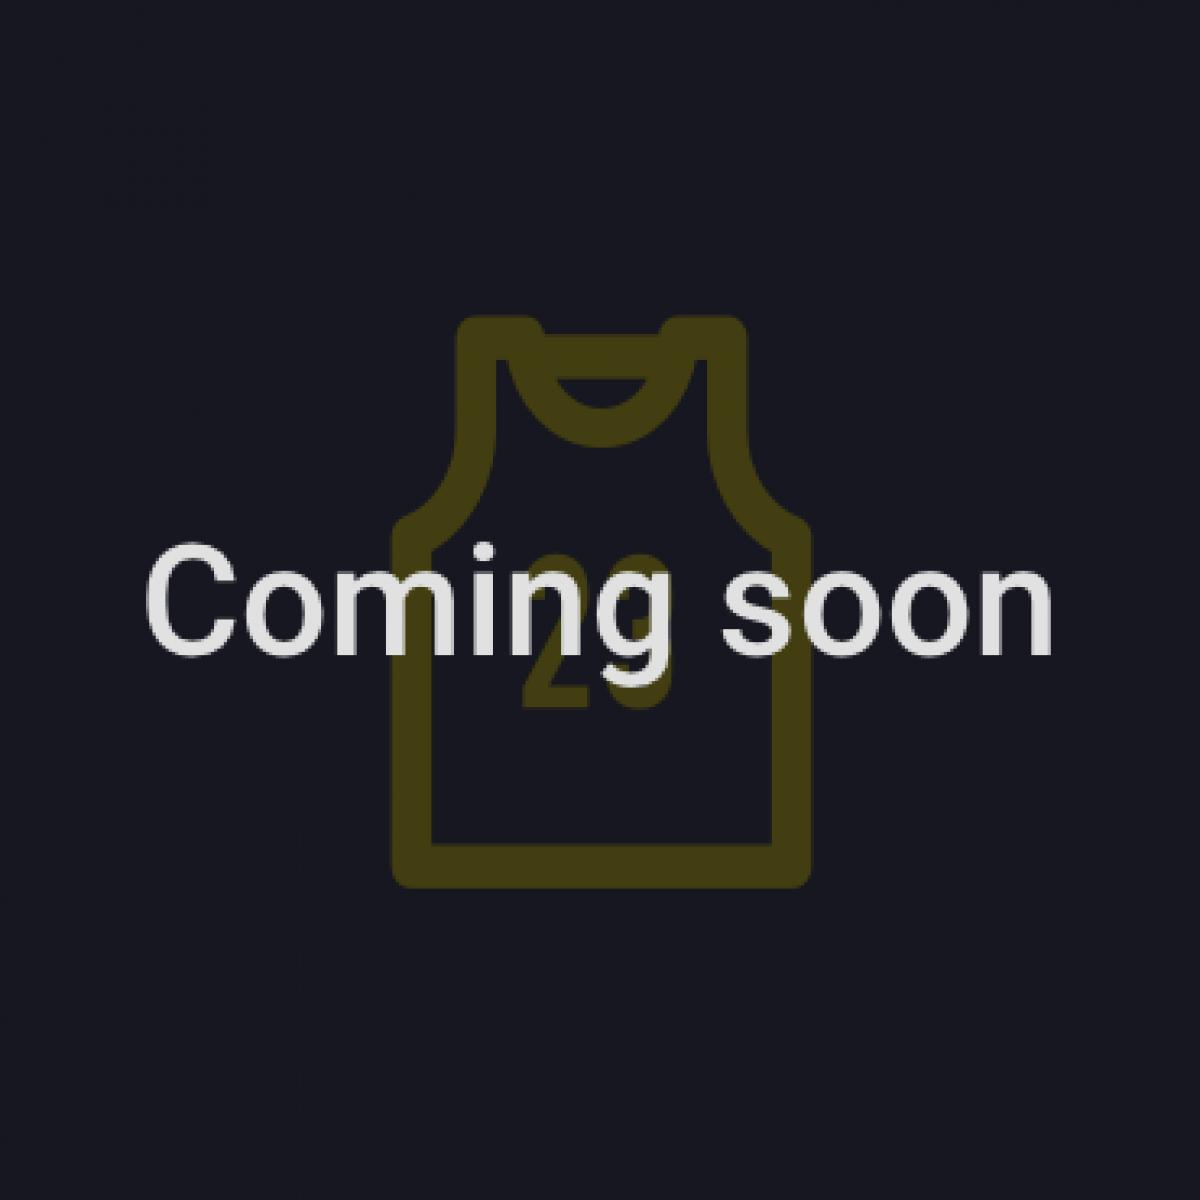 lockeroom-soon